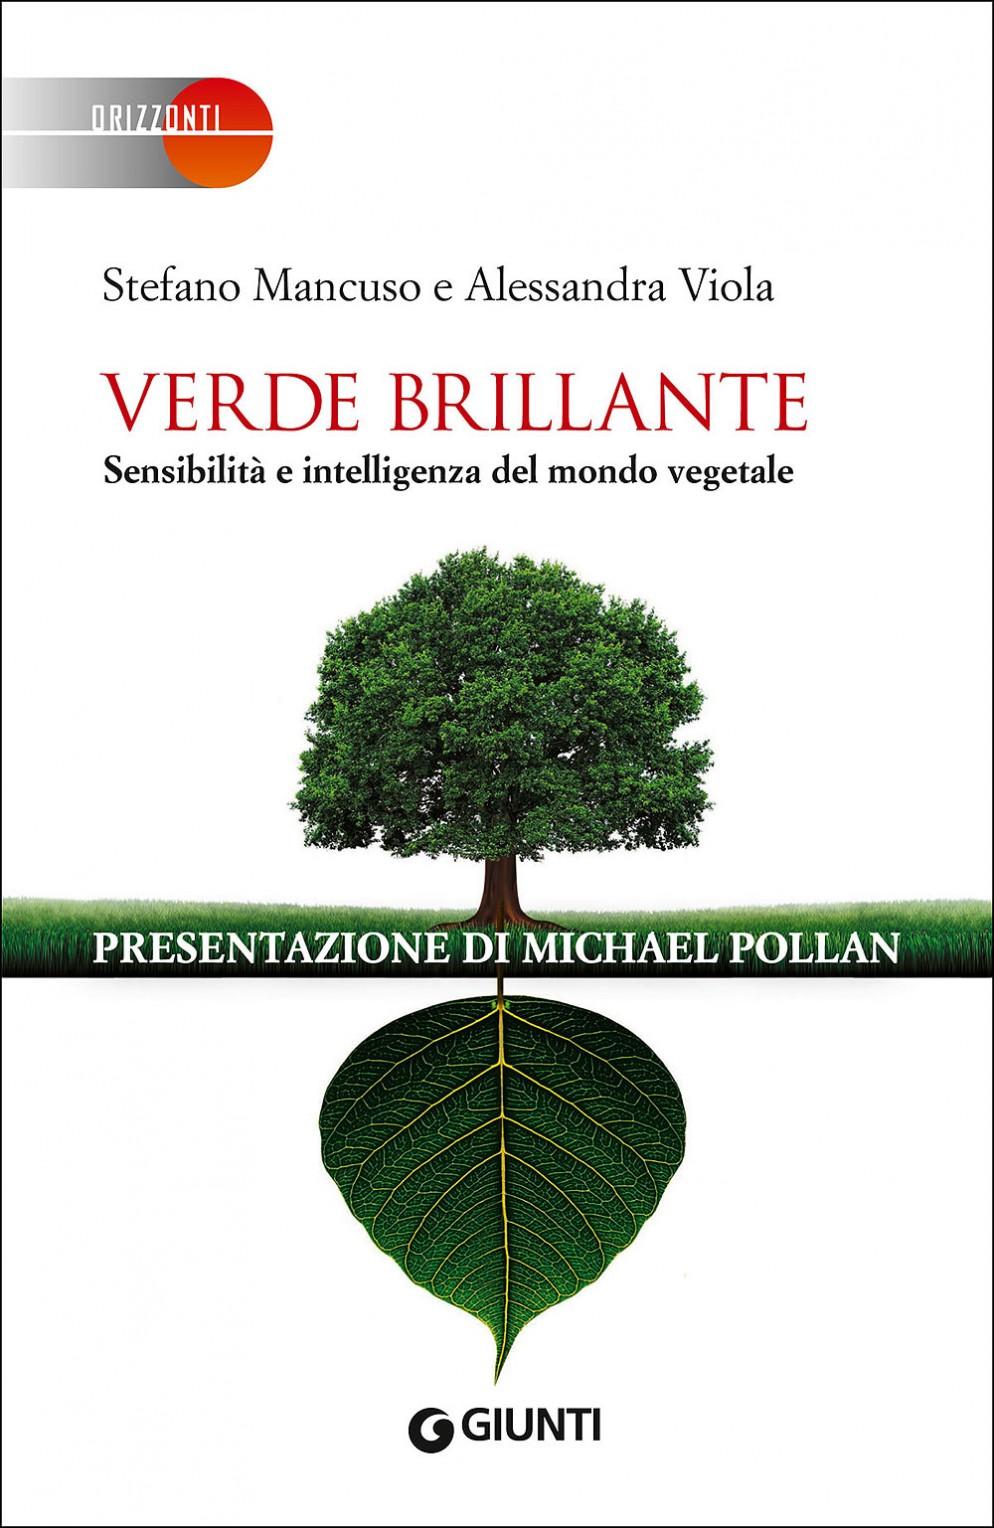 stefano-mancuso-libro-Verde brillante